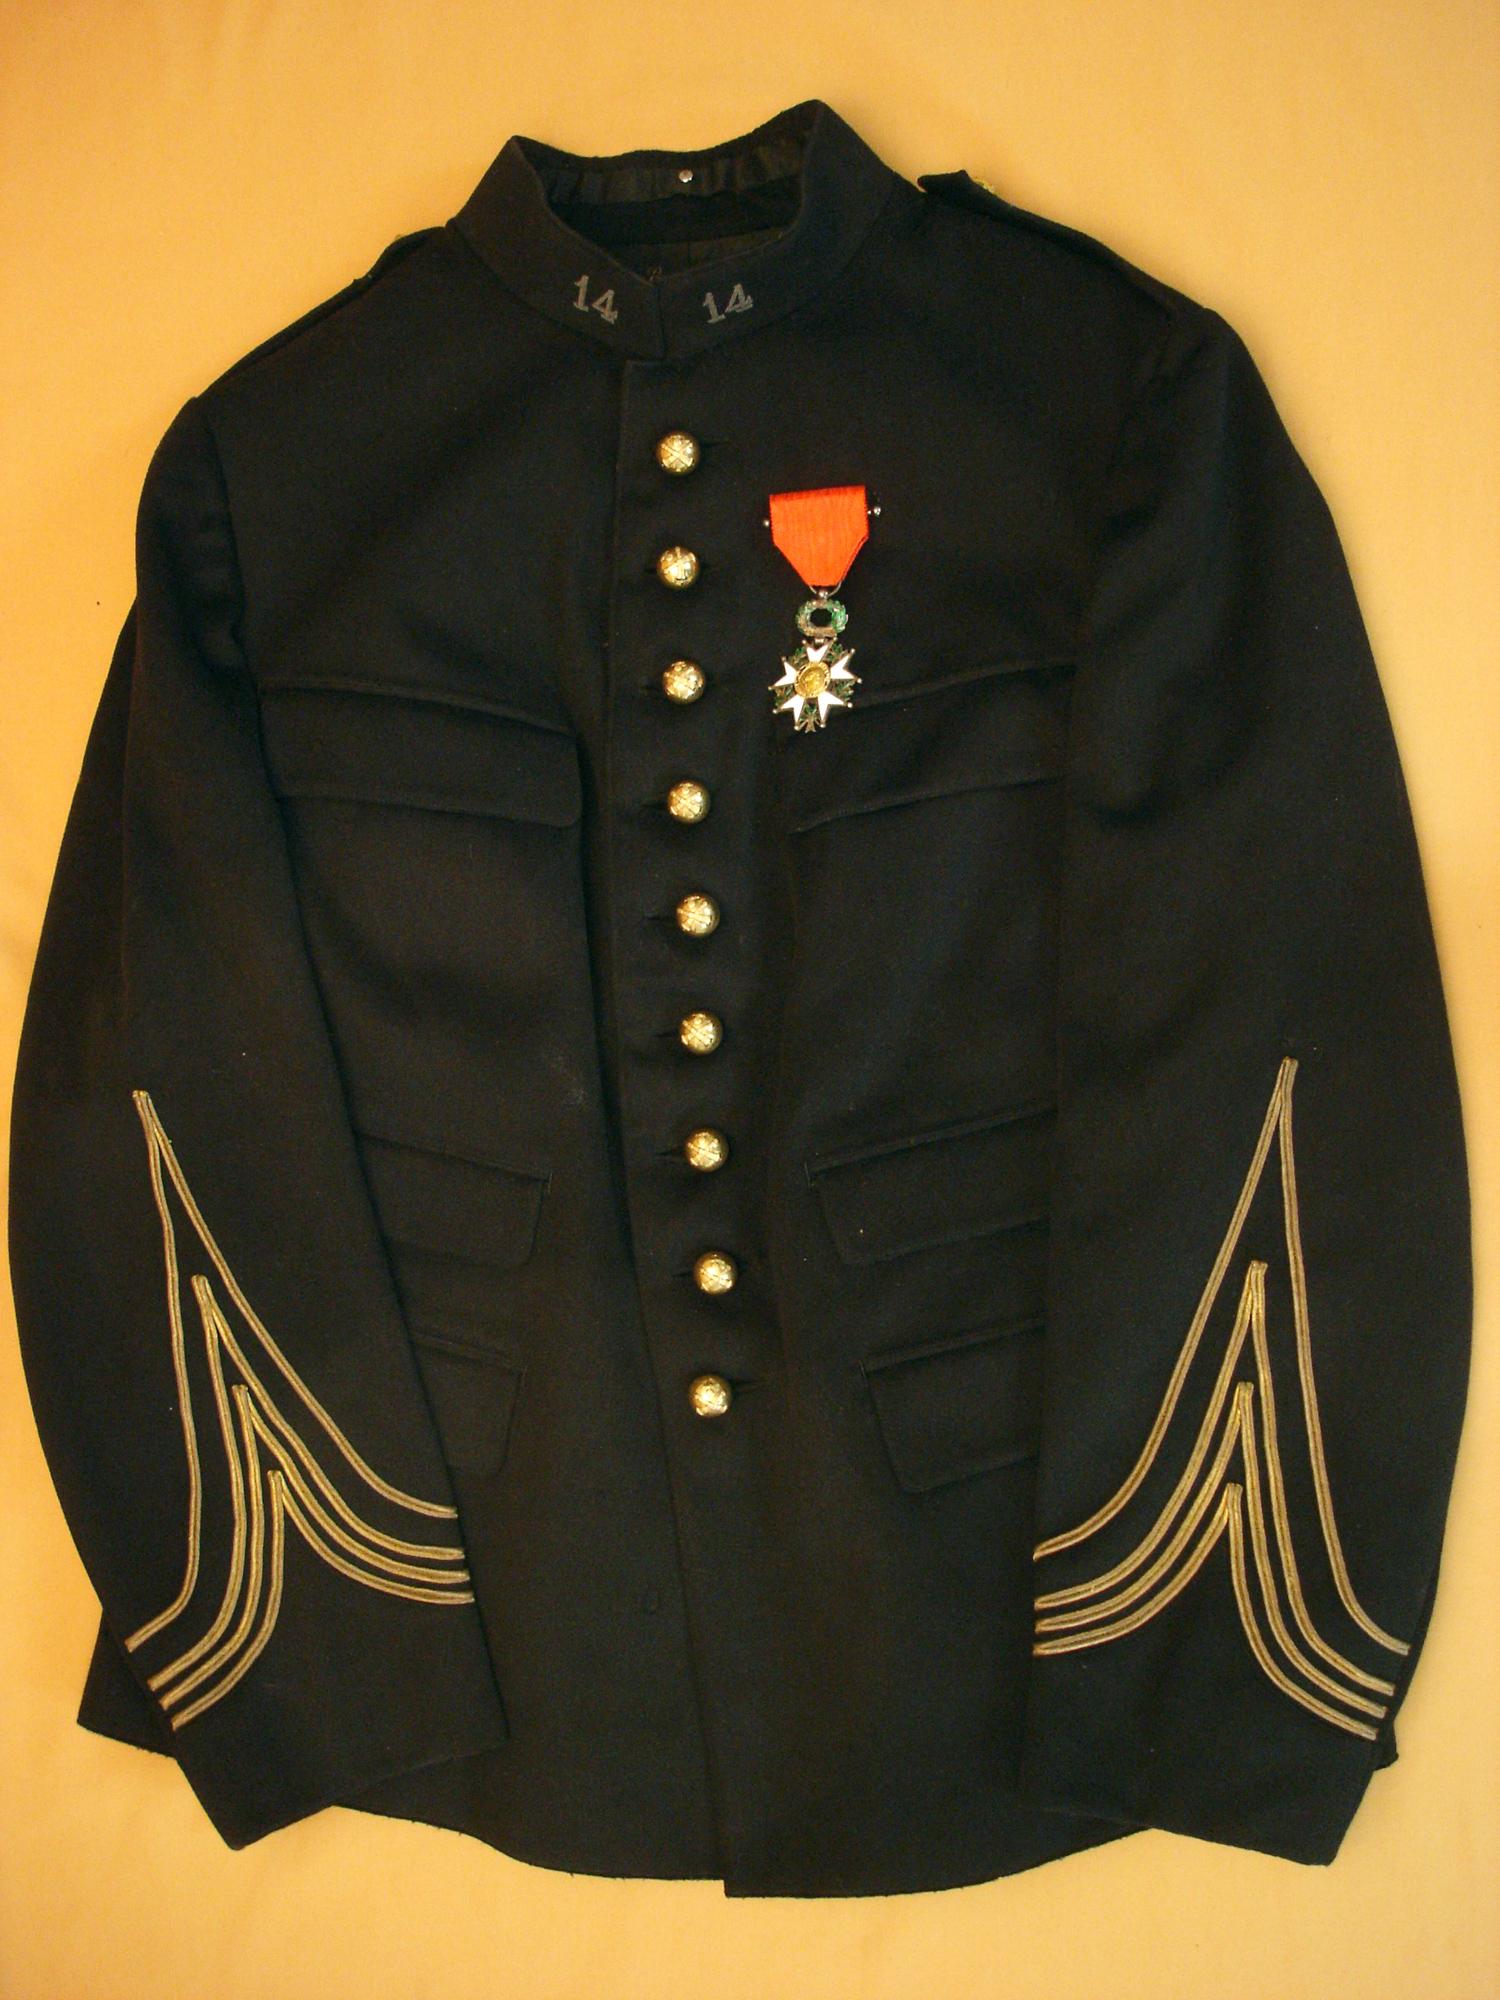 Vareuse Commandant d'artillerie 1900/1914.